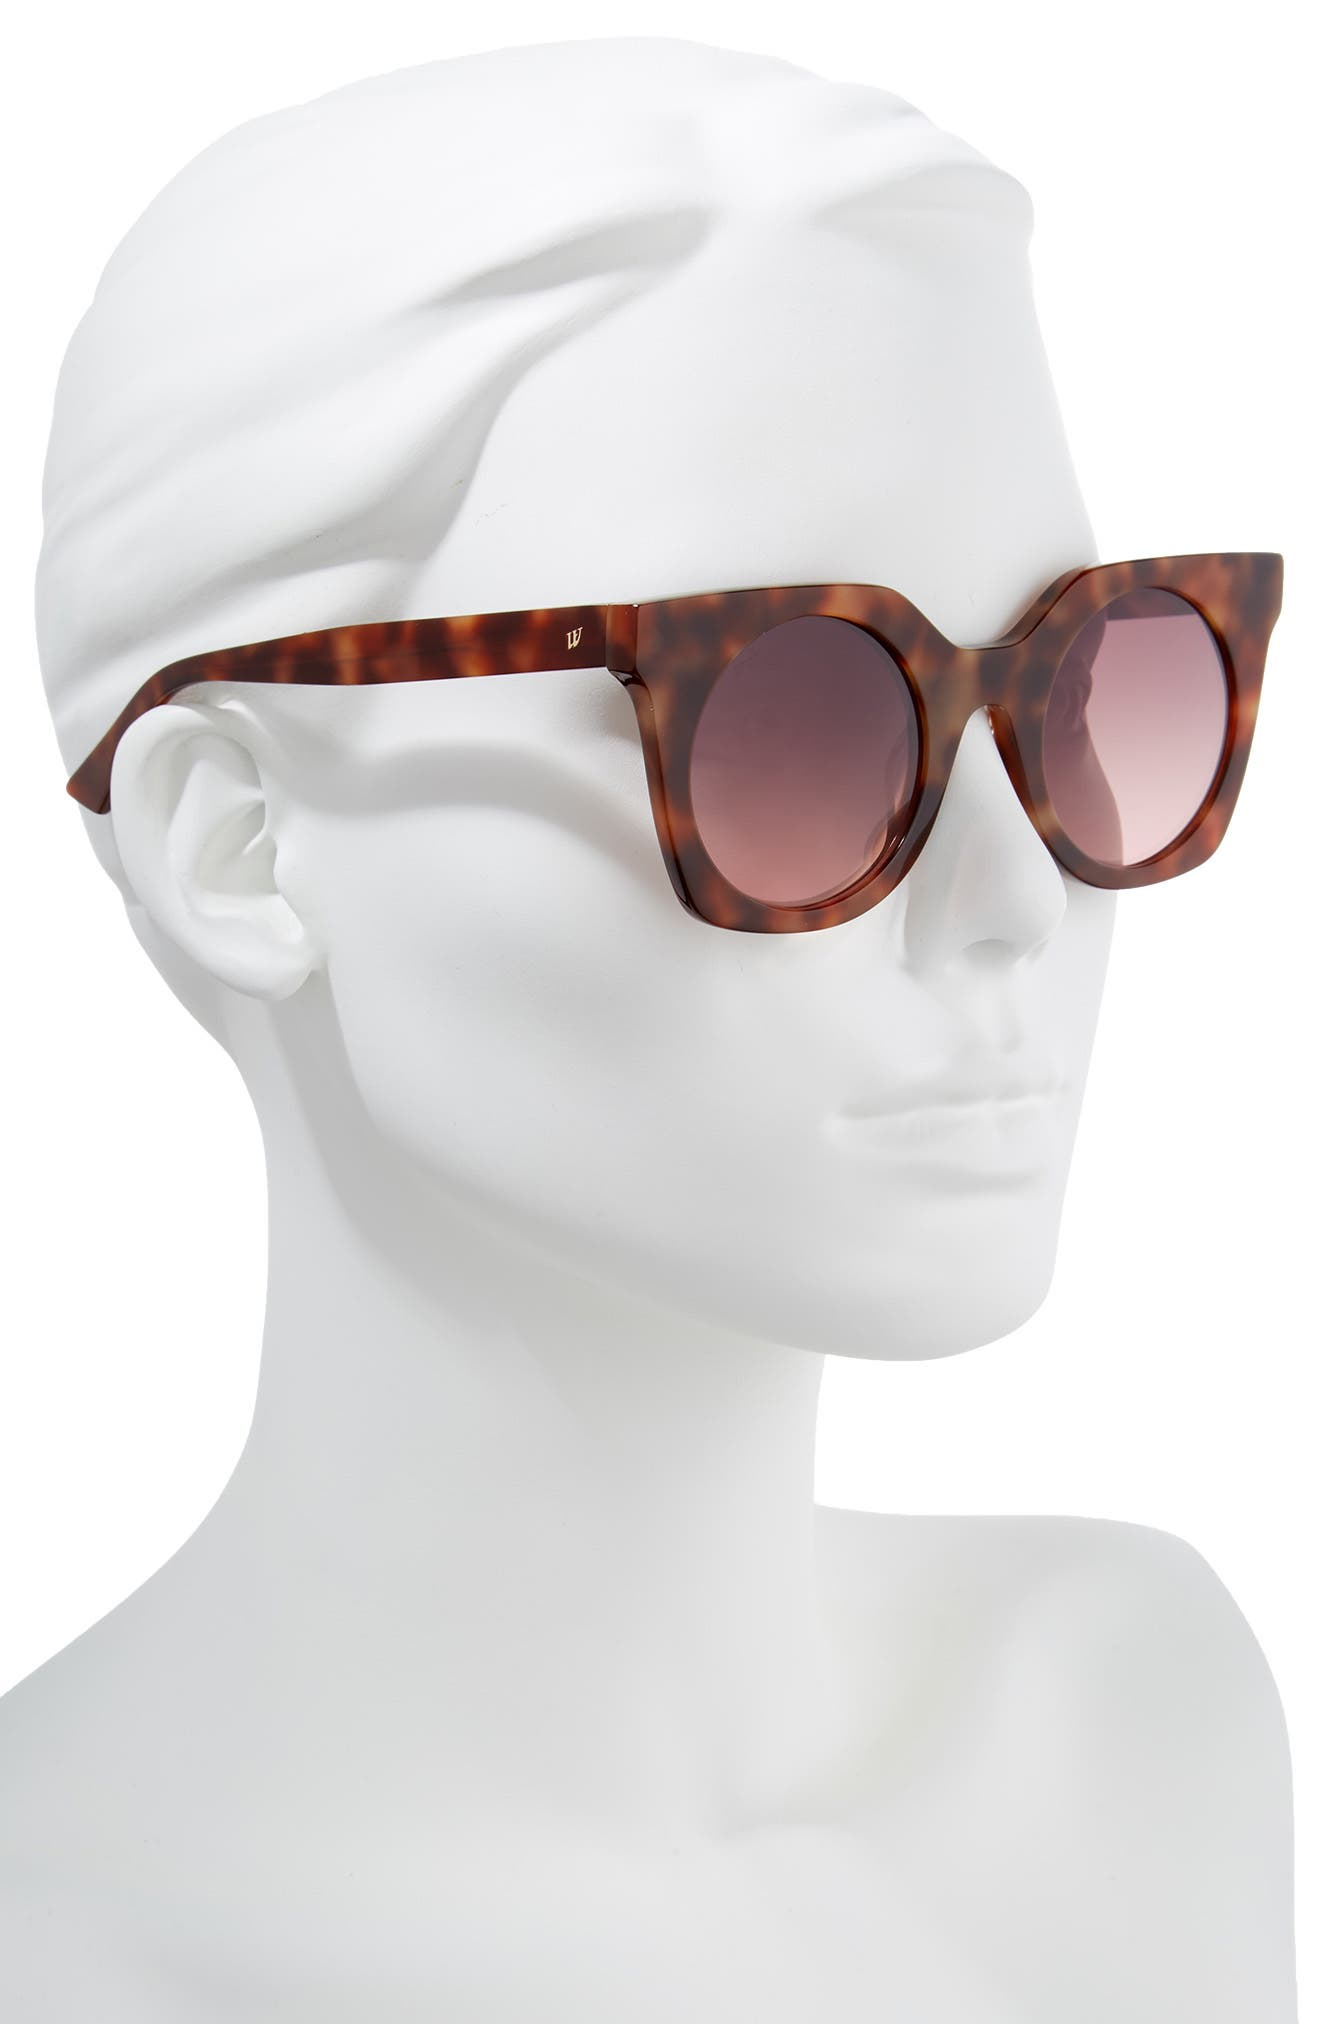 48mm Sunglasses,                             Alternate thumbnail 2, color,                             BLONDE HAVANA/ GRADIENT